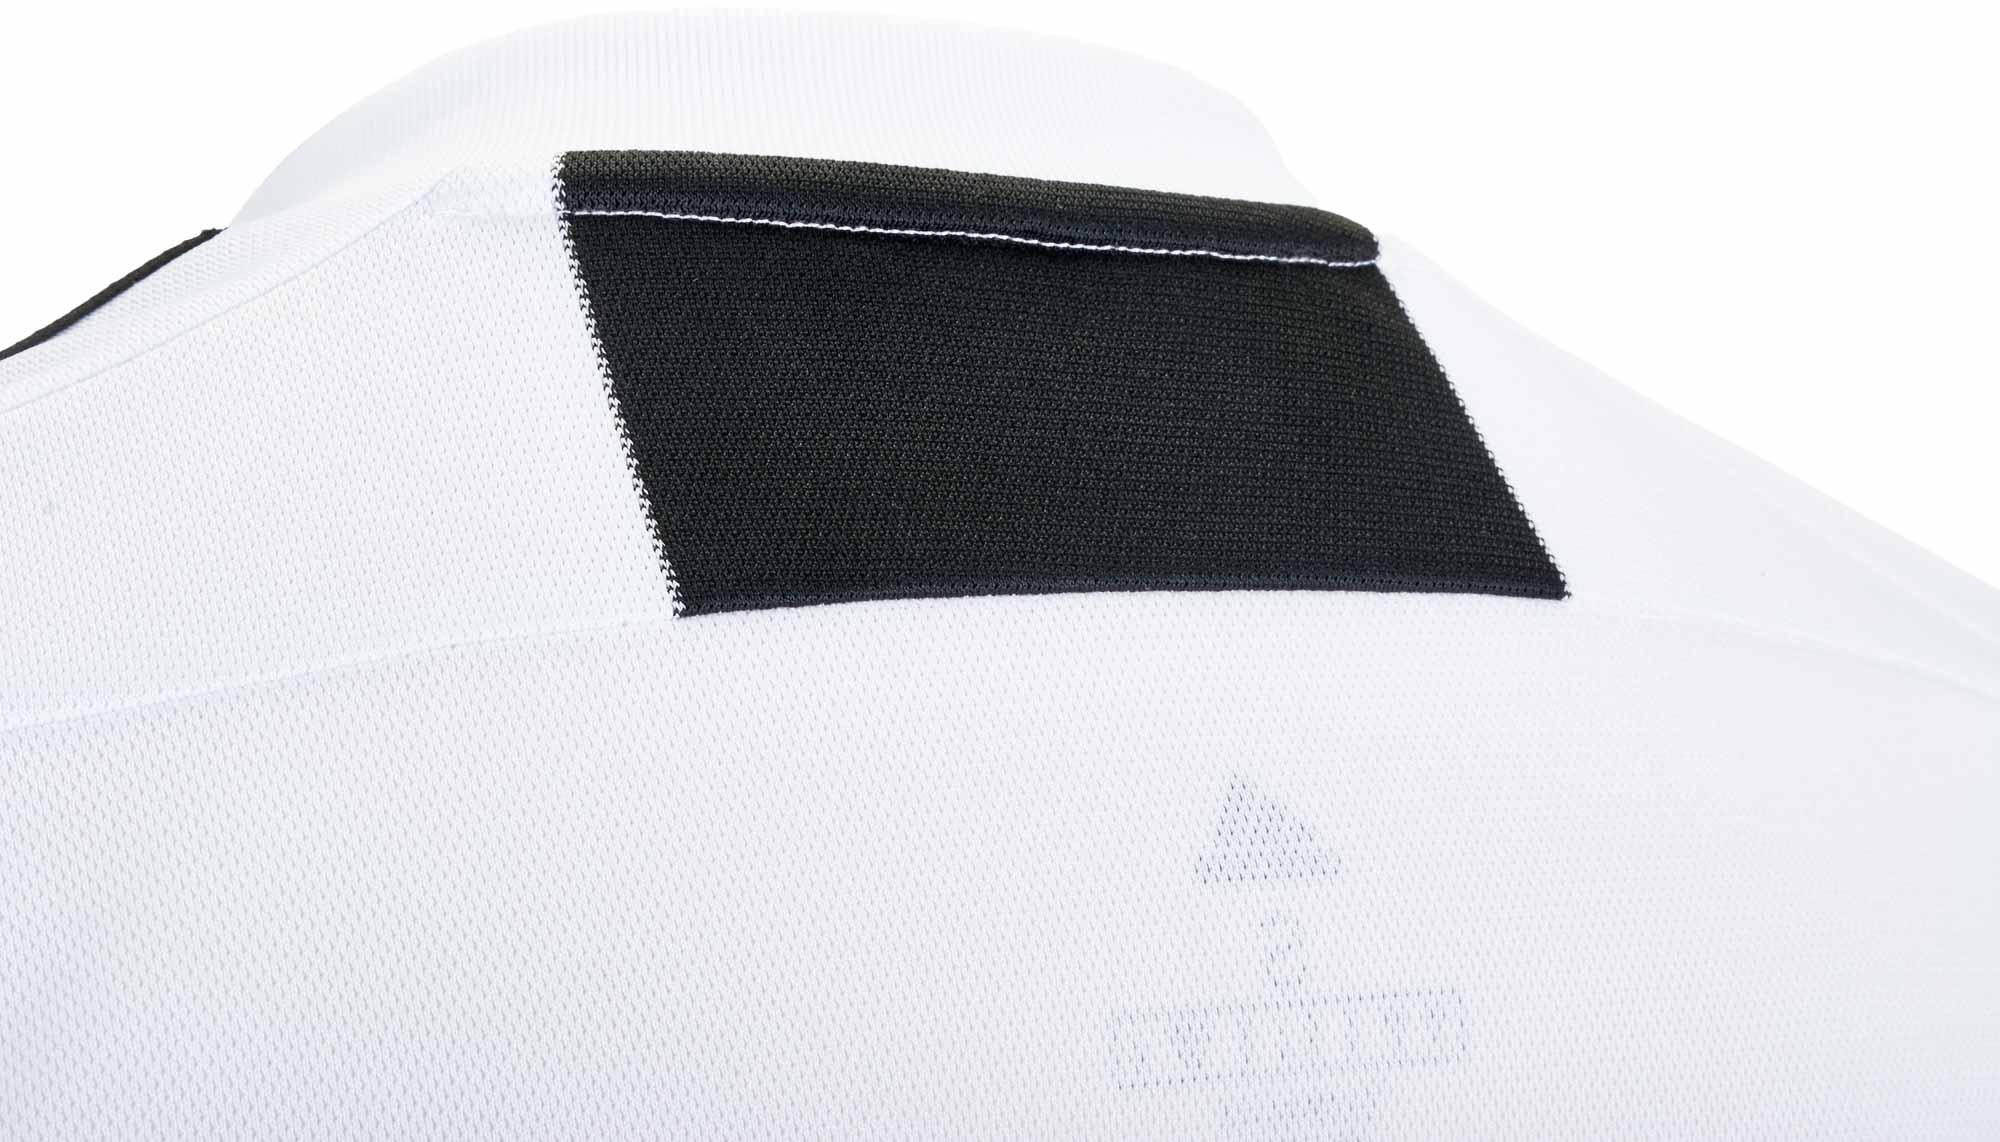 Paris Saint-Germain 3rd Jordan Football Shirt 18/19 – White